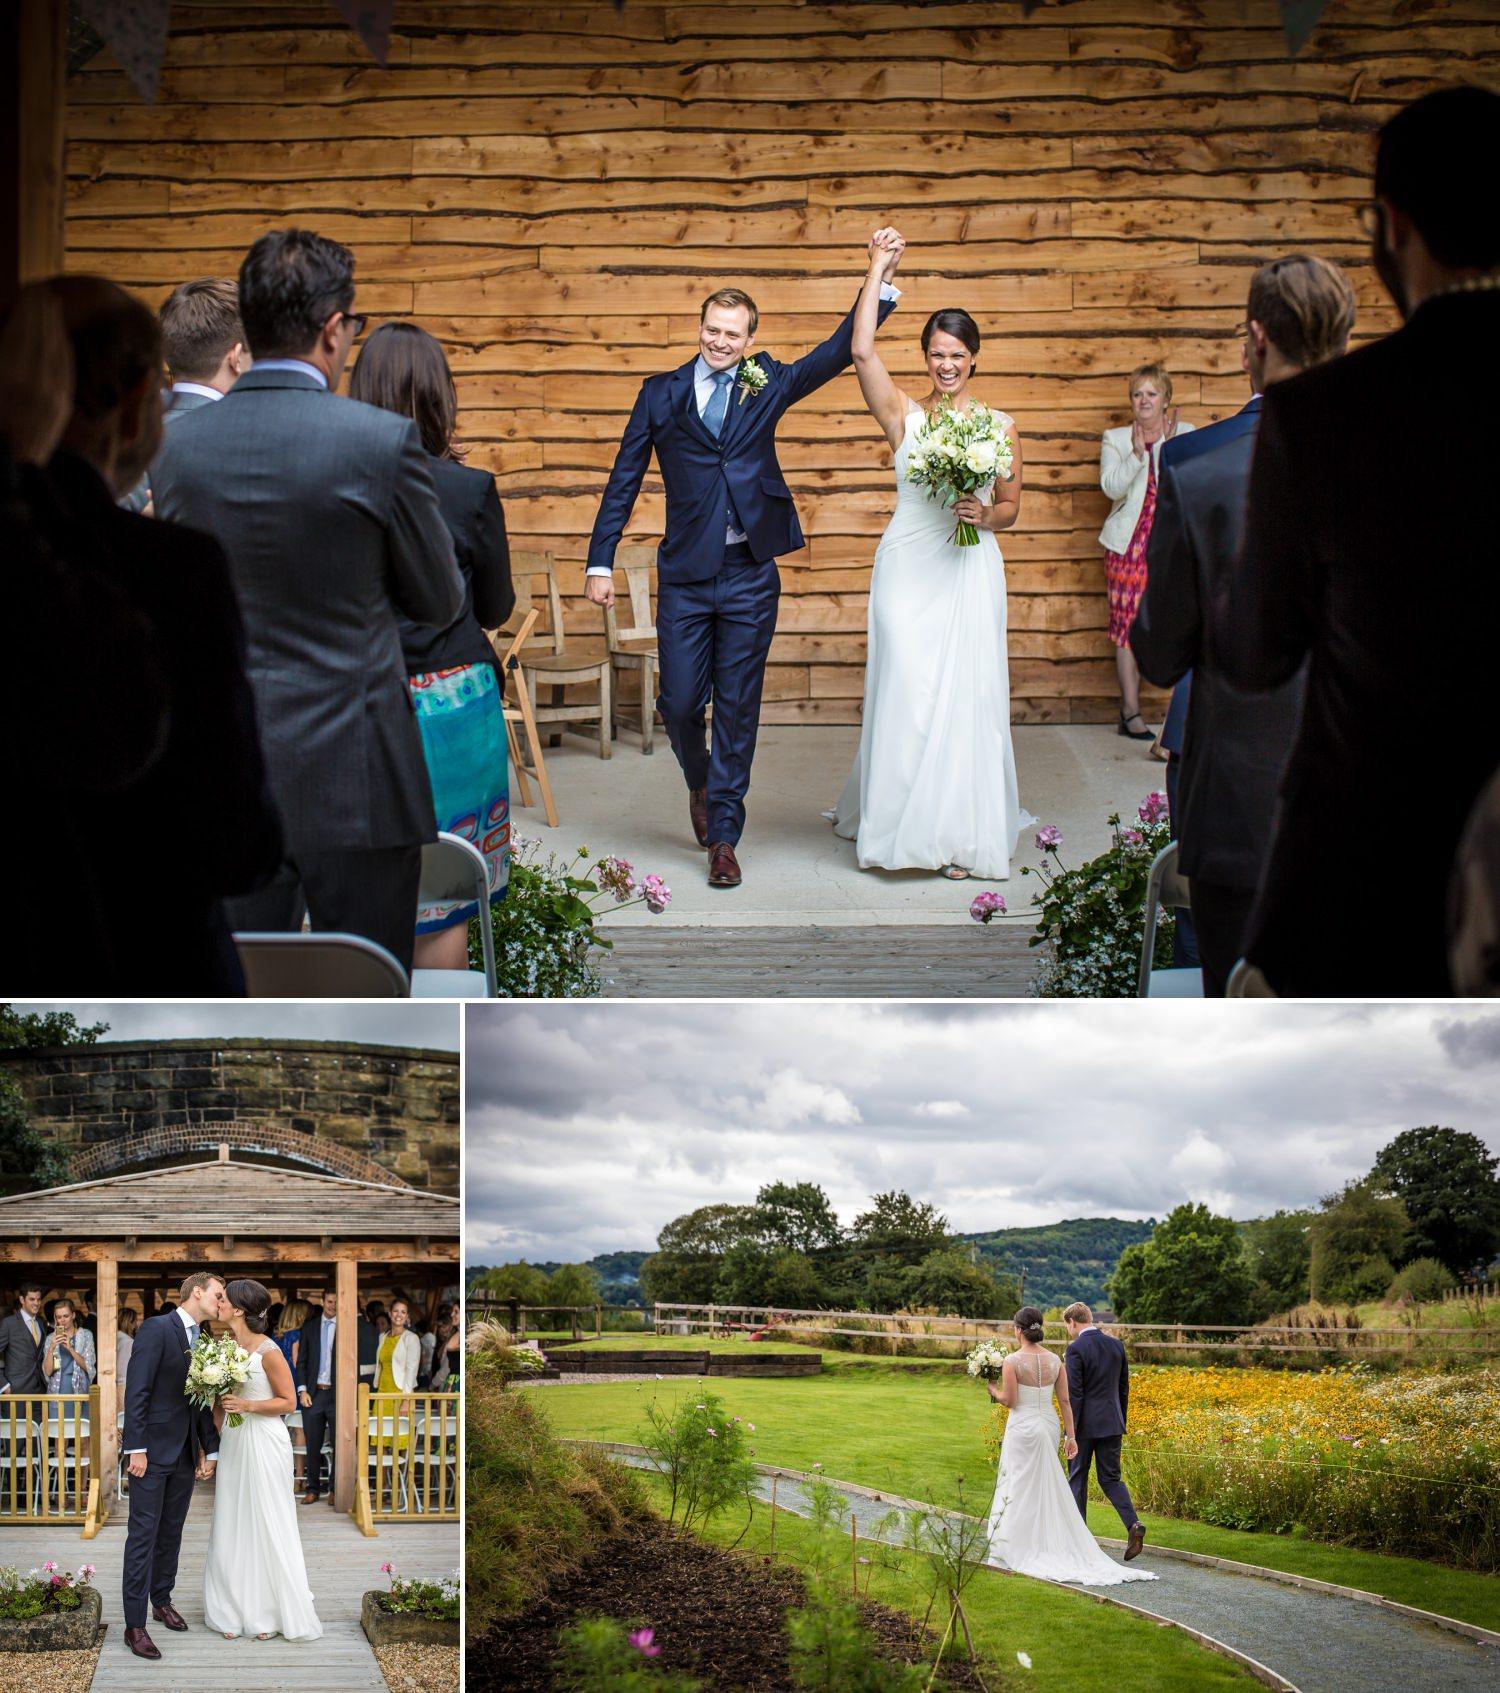 Wedding photographers Tower Hill Barns, Wrexham, North Wales